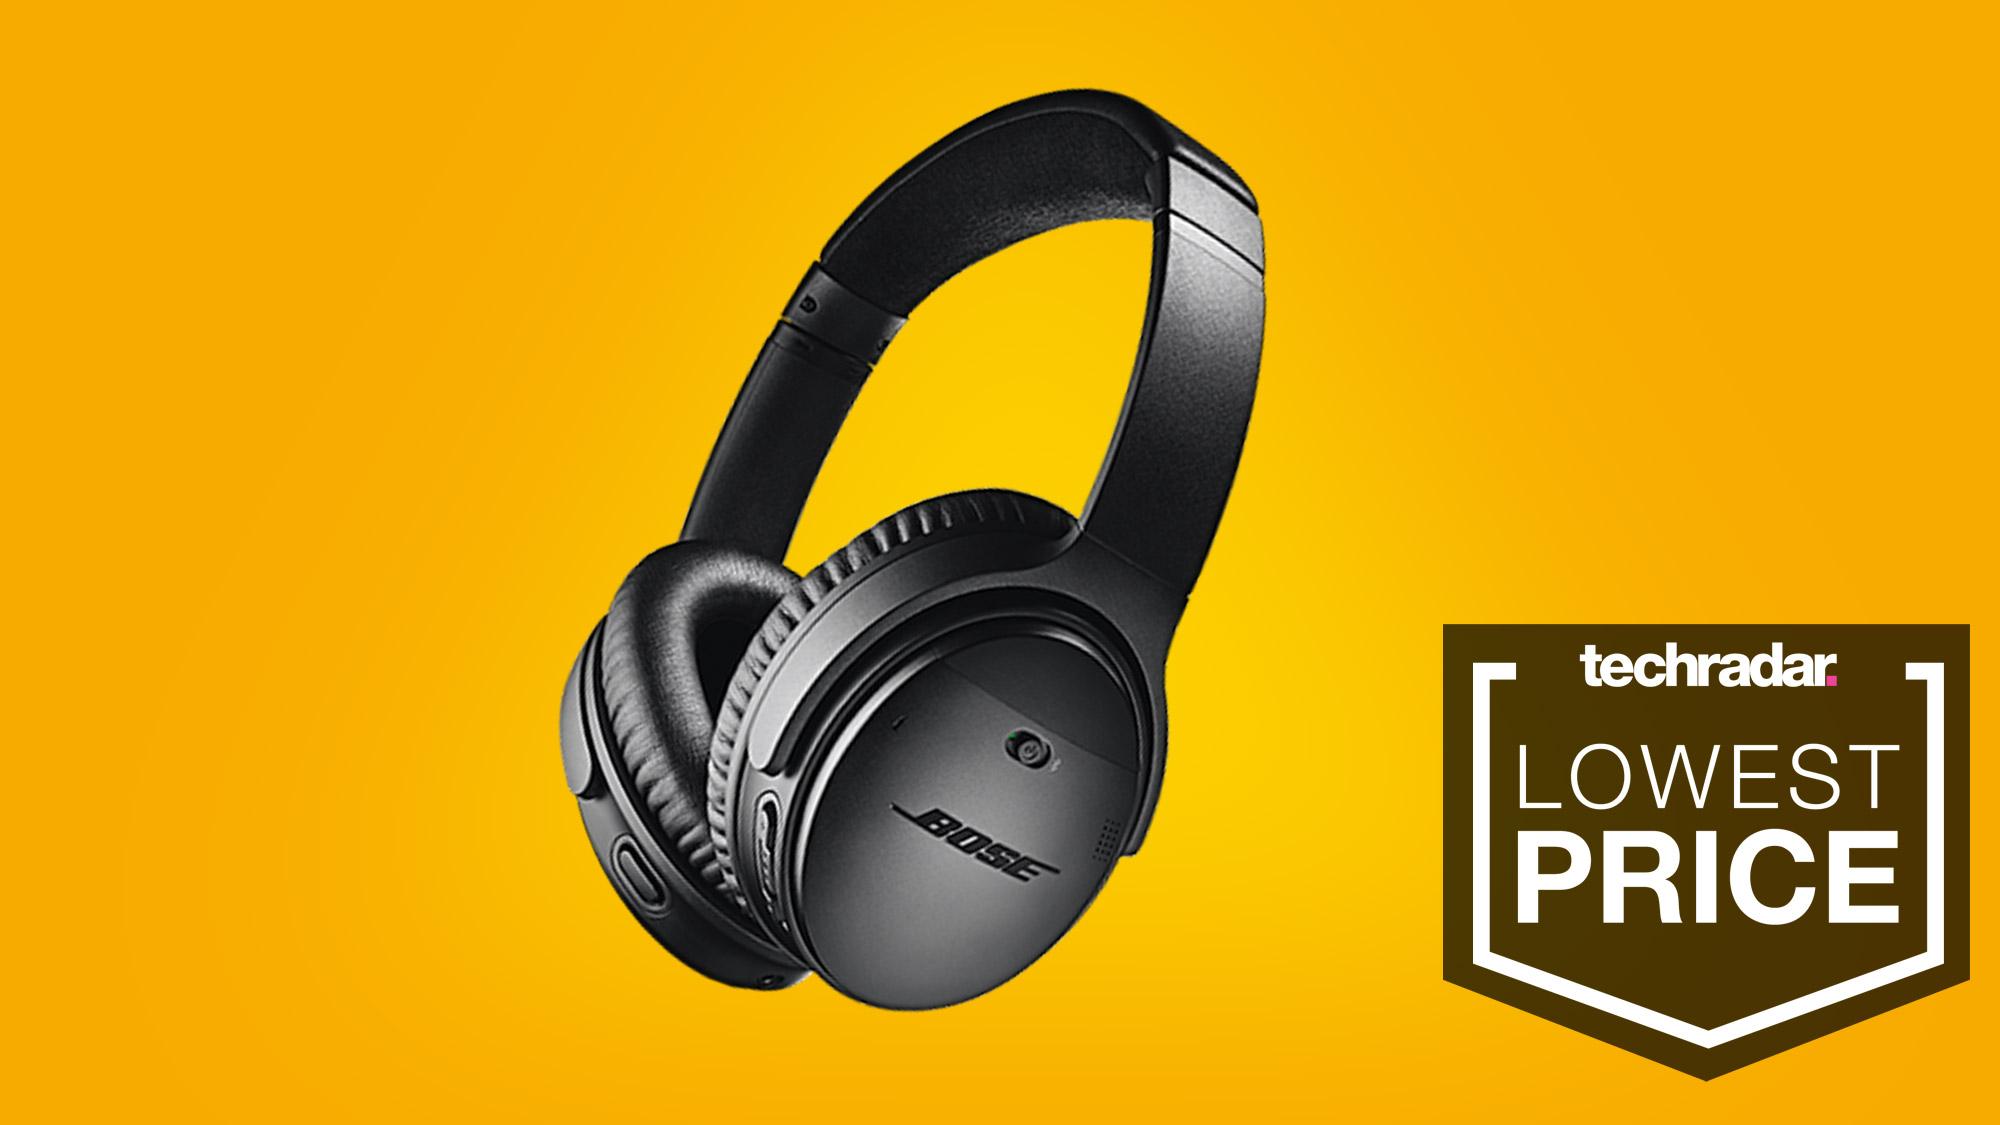 Bose's QuietComfort 35 II headphones hit lowest price ever at Amazon